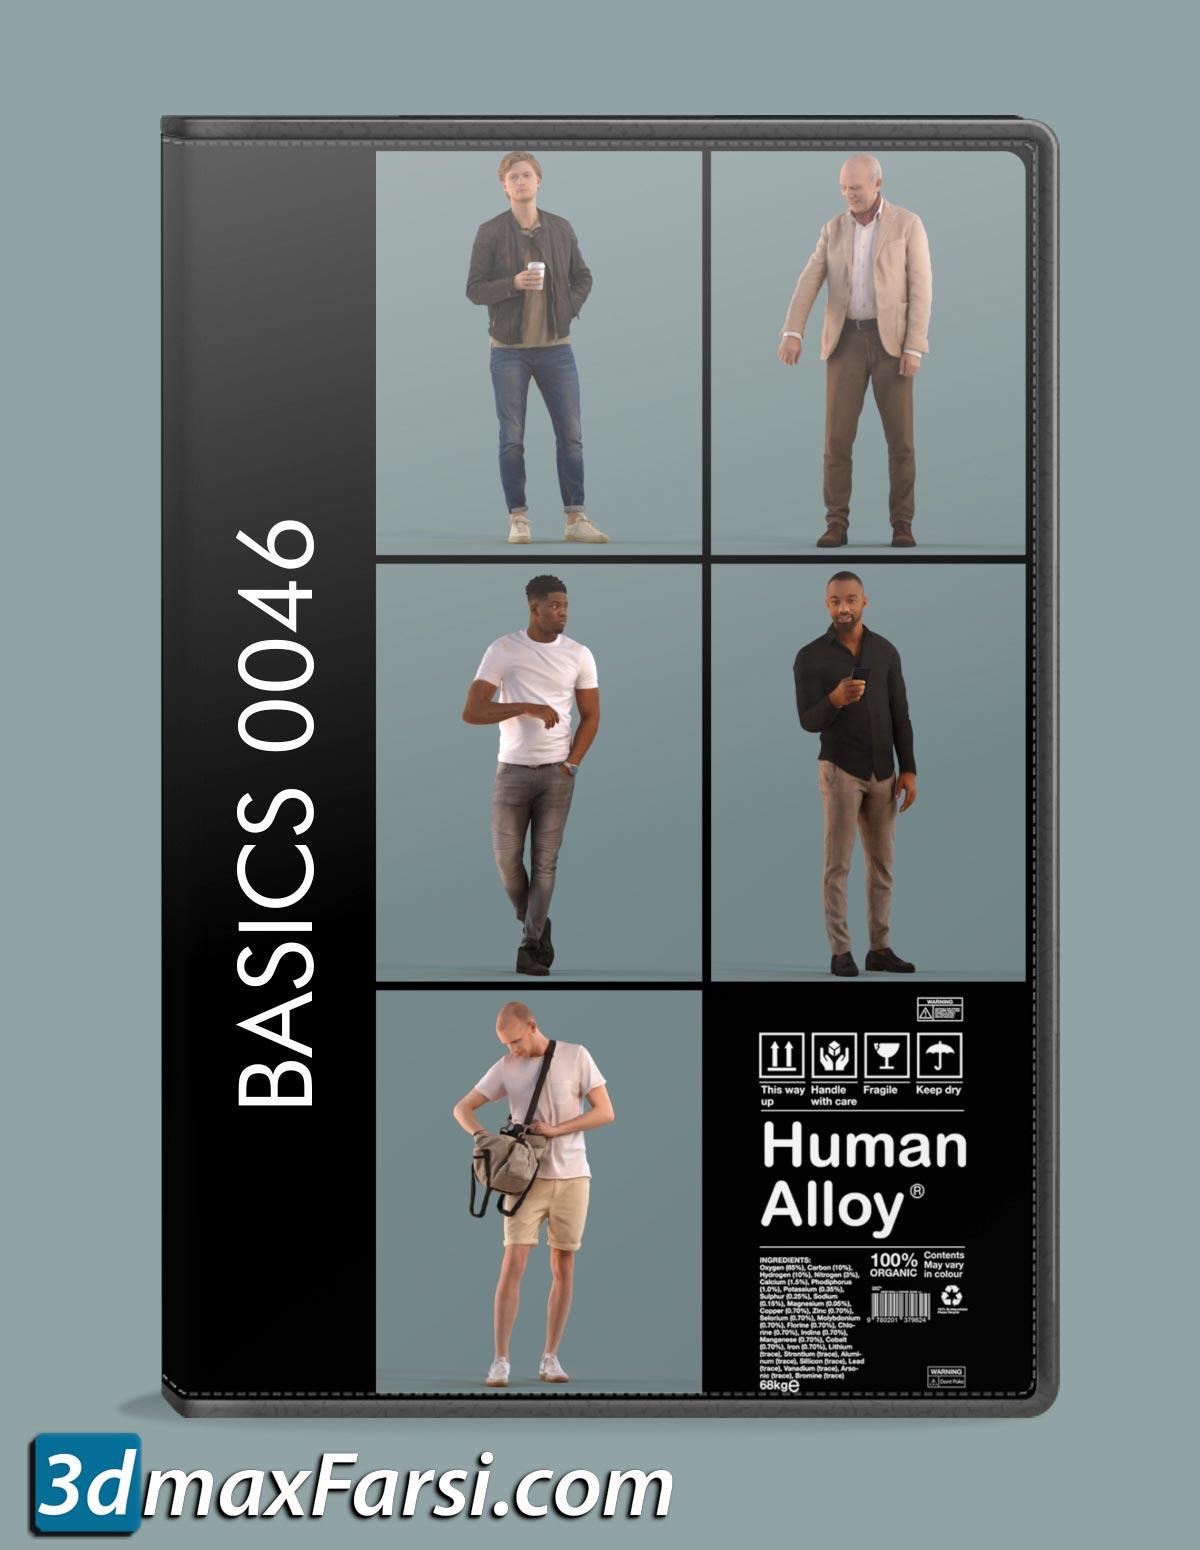 Human Alloy Basics 0046 – 3D people free download